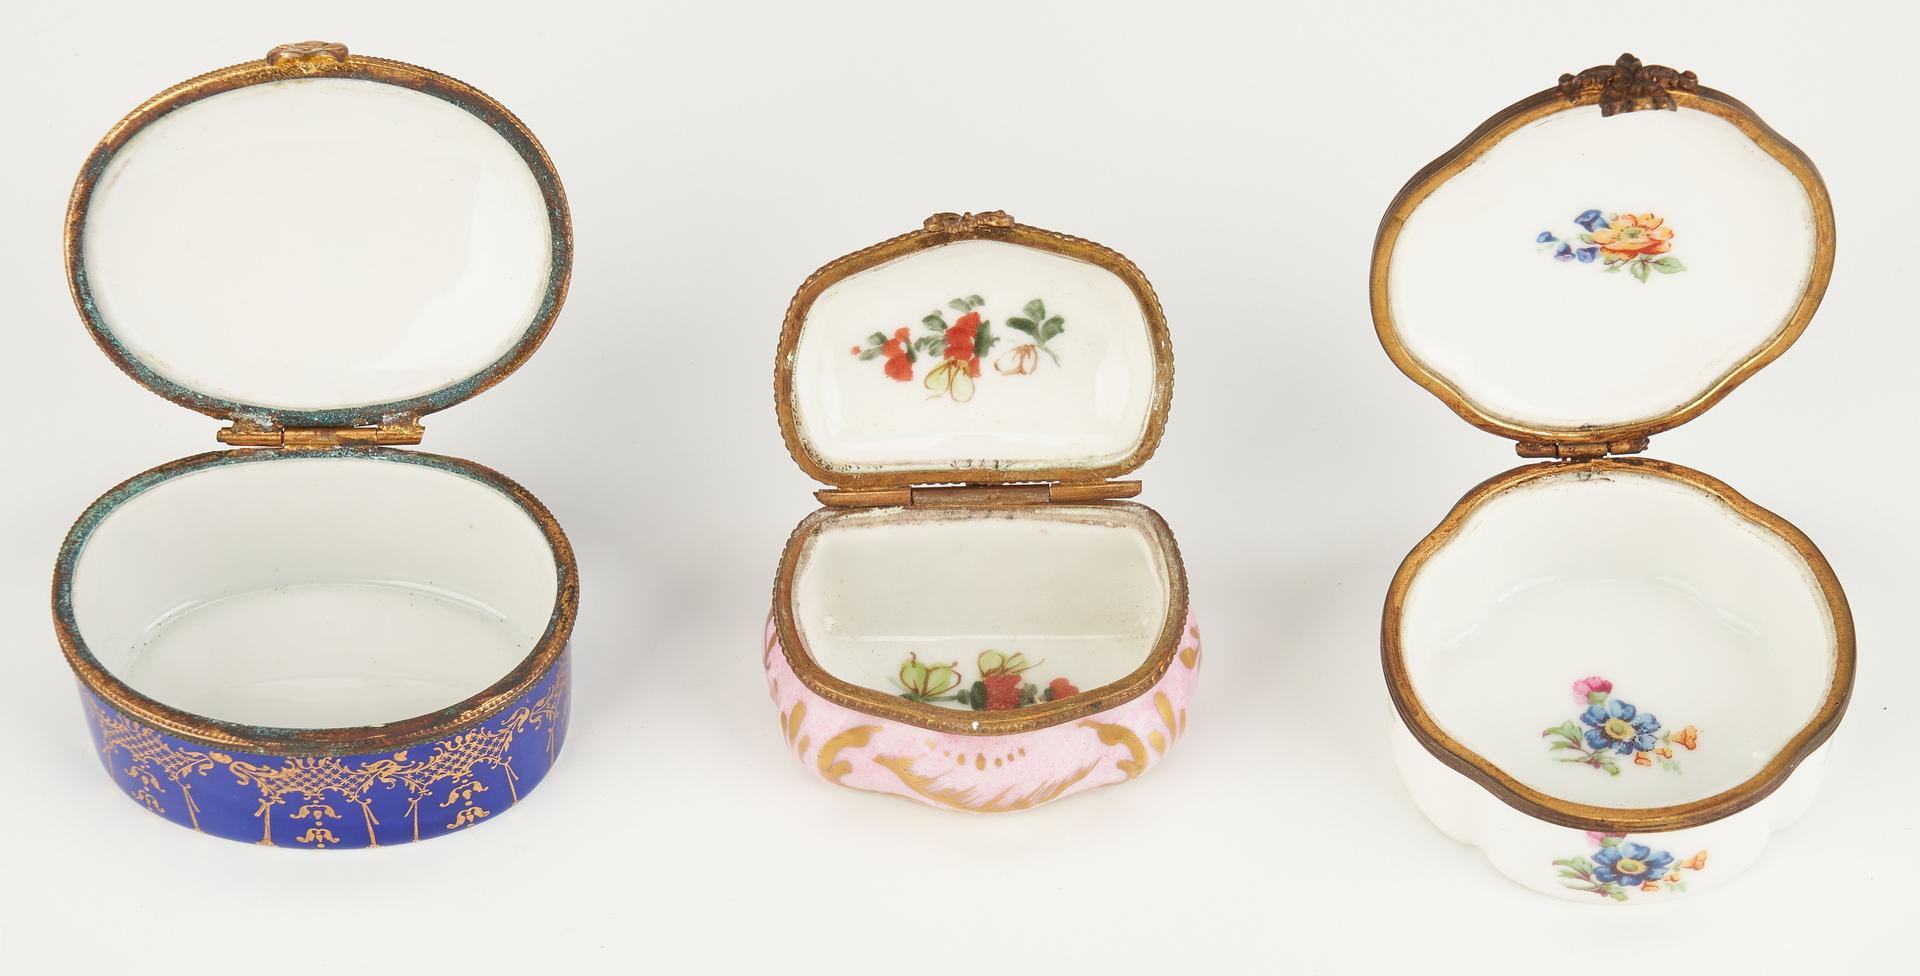 Lot 1091: 7 Assorted European Porcelain Pill or Trinket Boxes